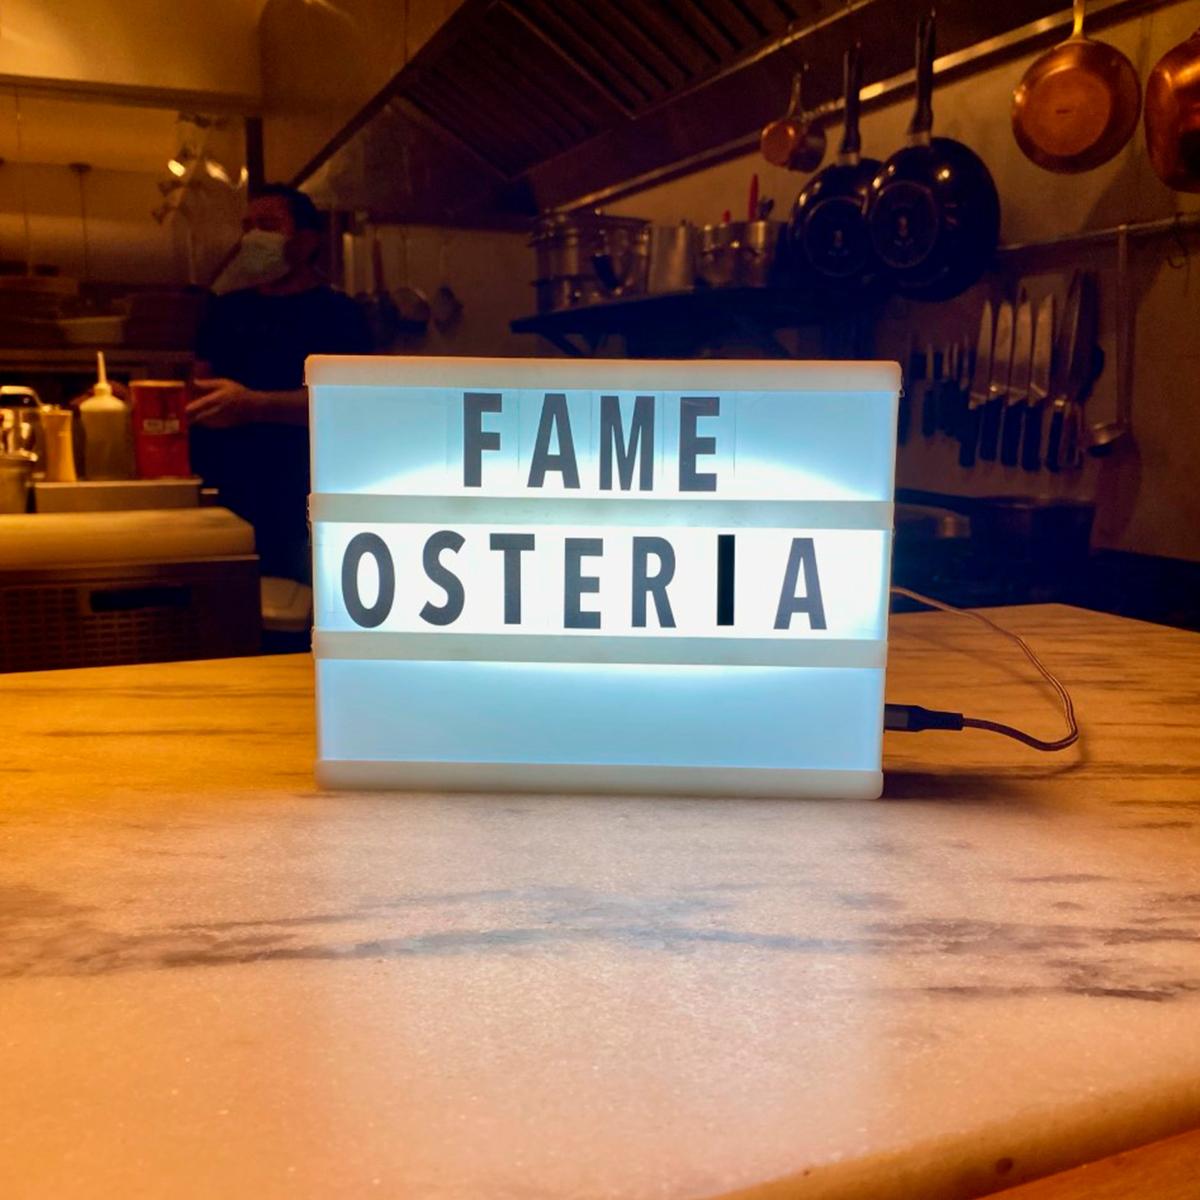 Fame Ostearia